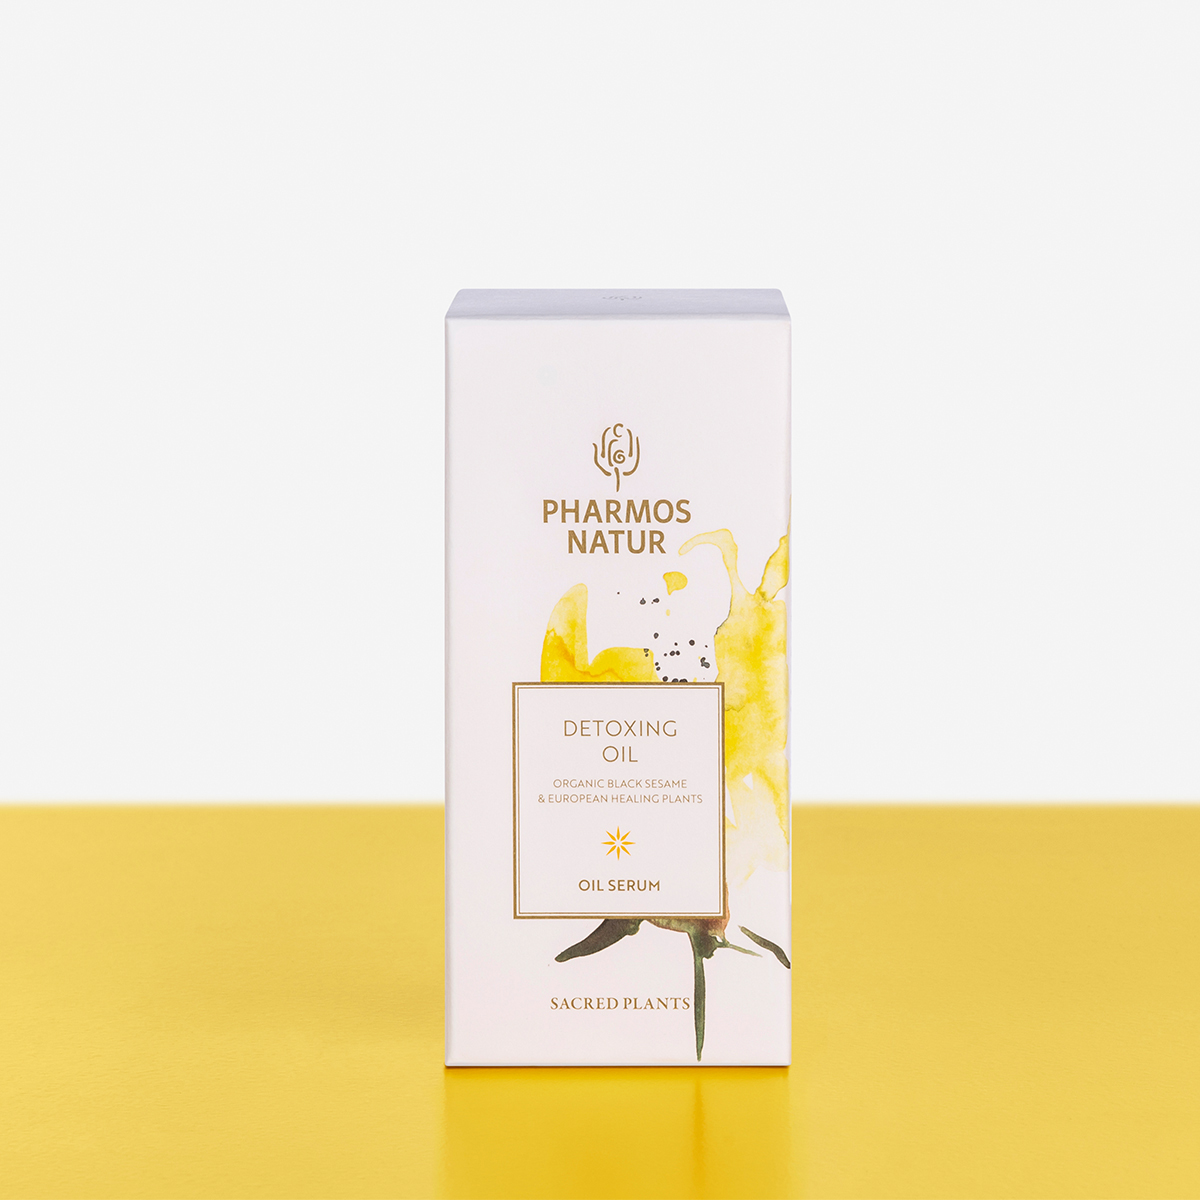 Verpackung Detoxing Oil Produktbild